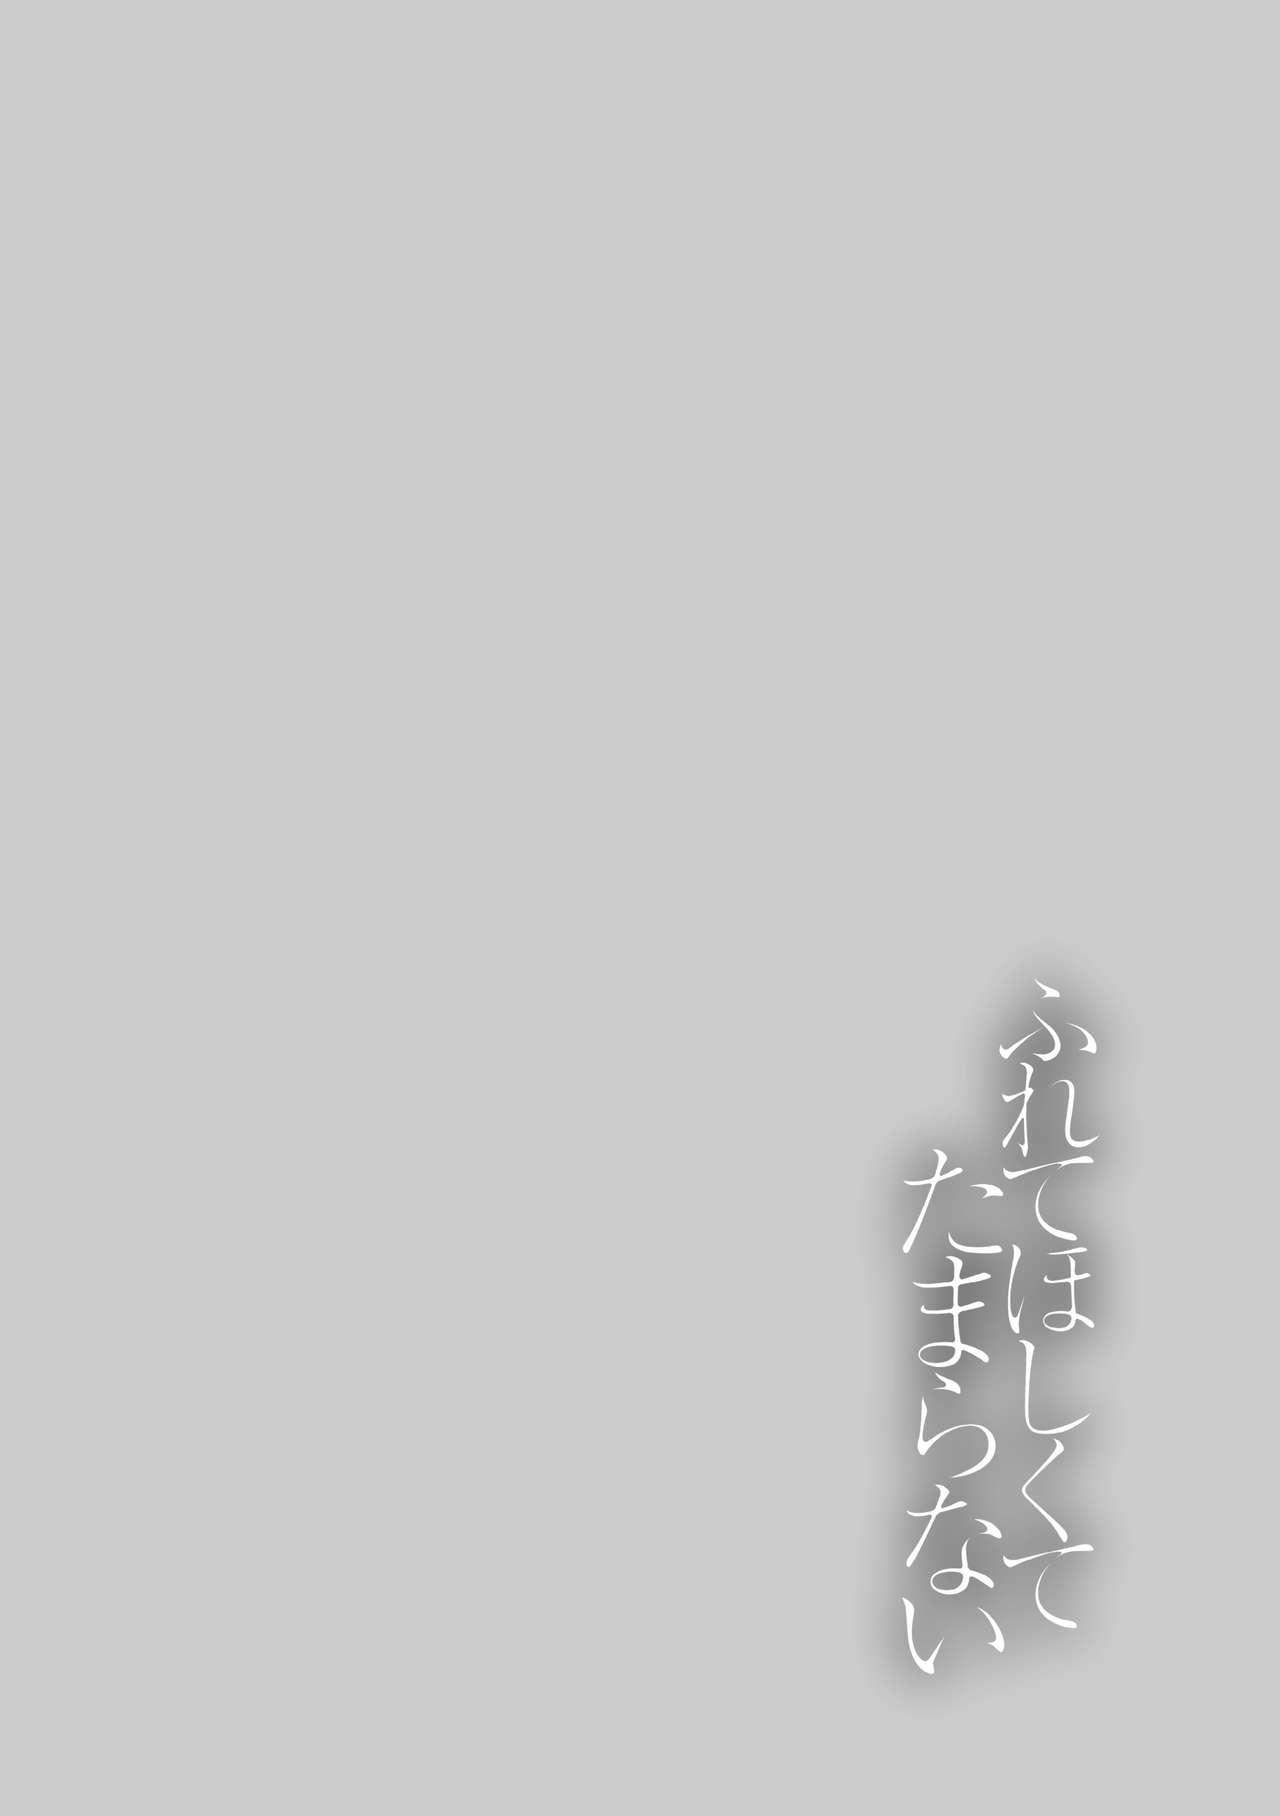 Furete Hoshikute Tamaranai 127